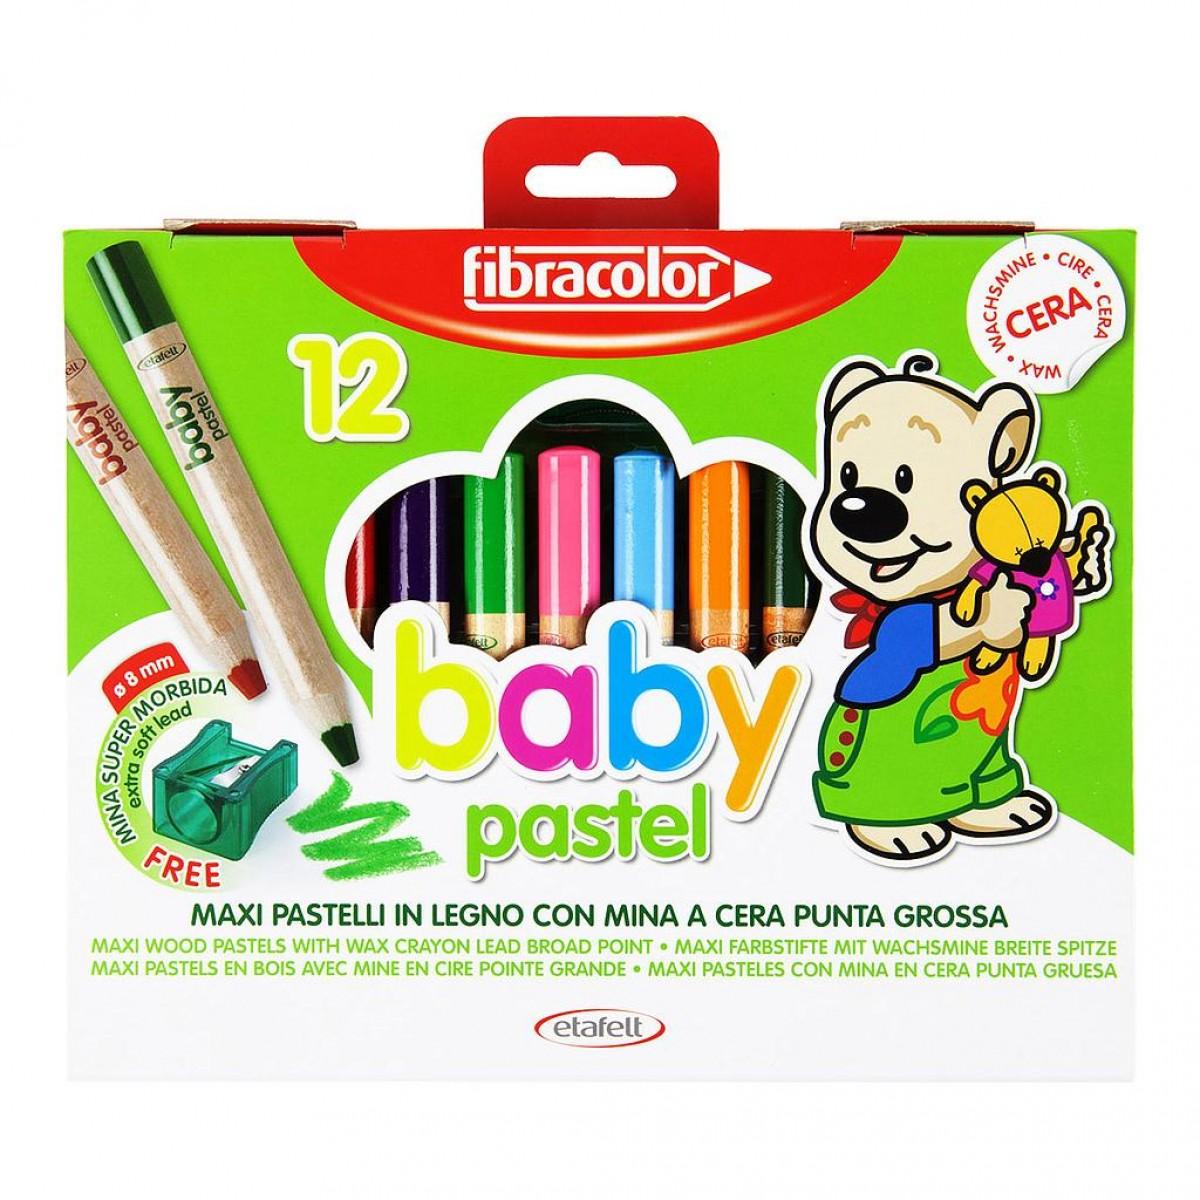 Fibracolor Κηρομπογιές Baby Pastel 1+ (6 Τεμ.)